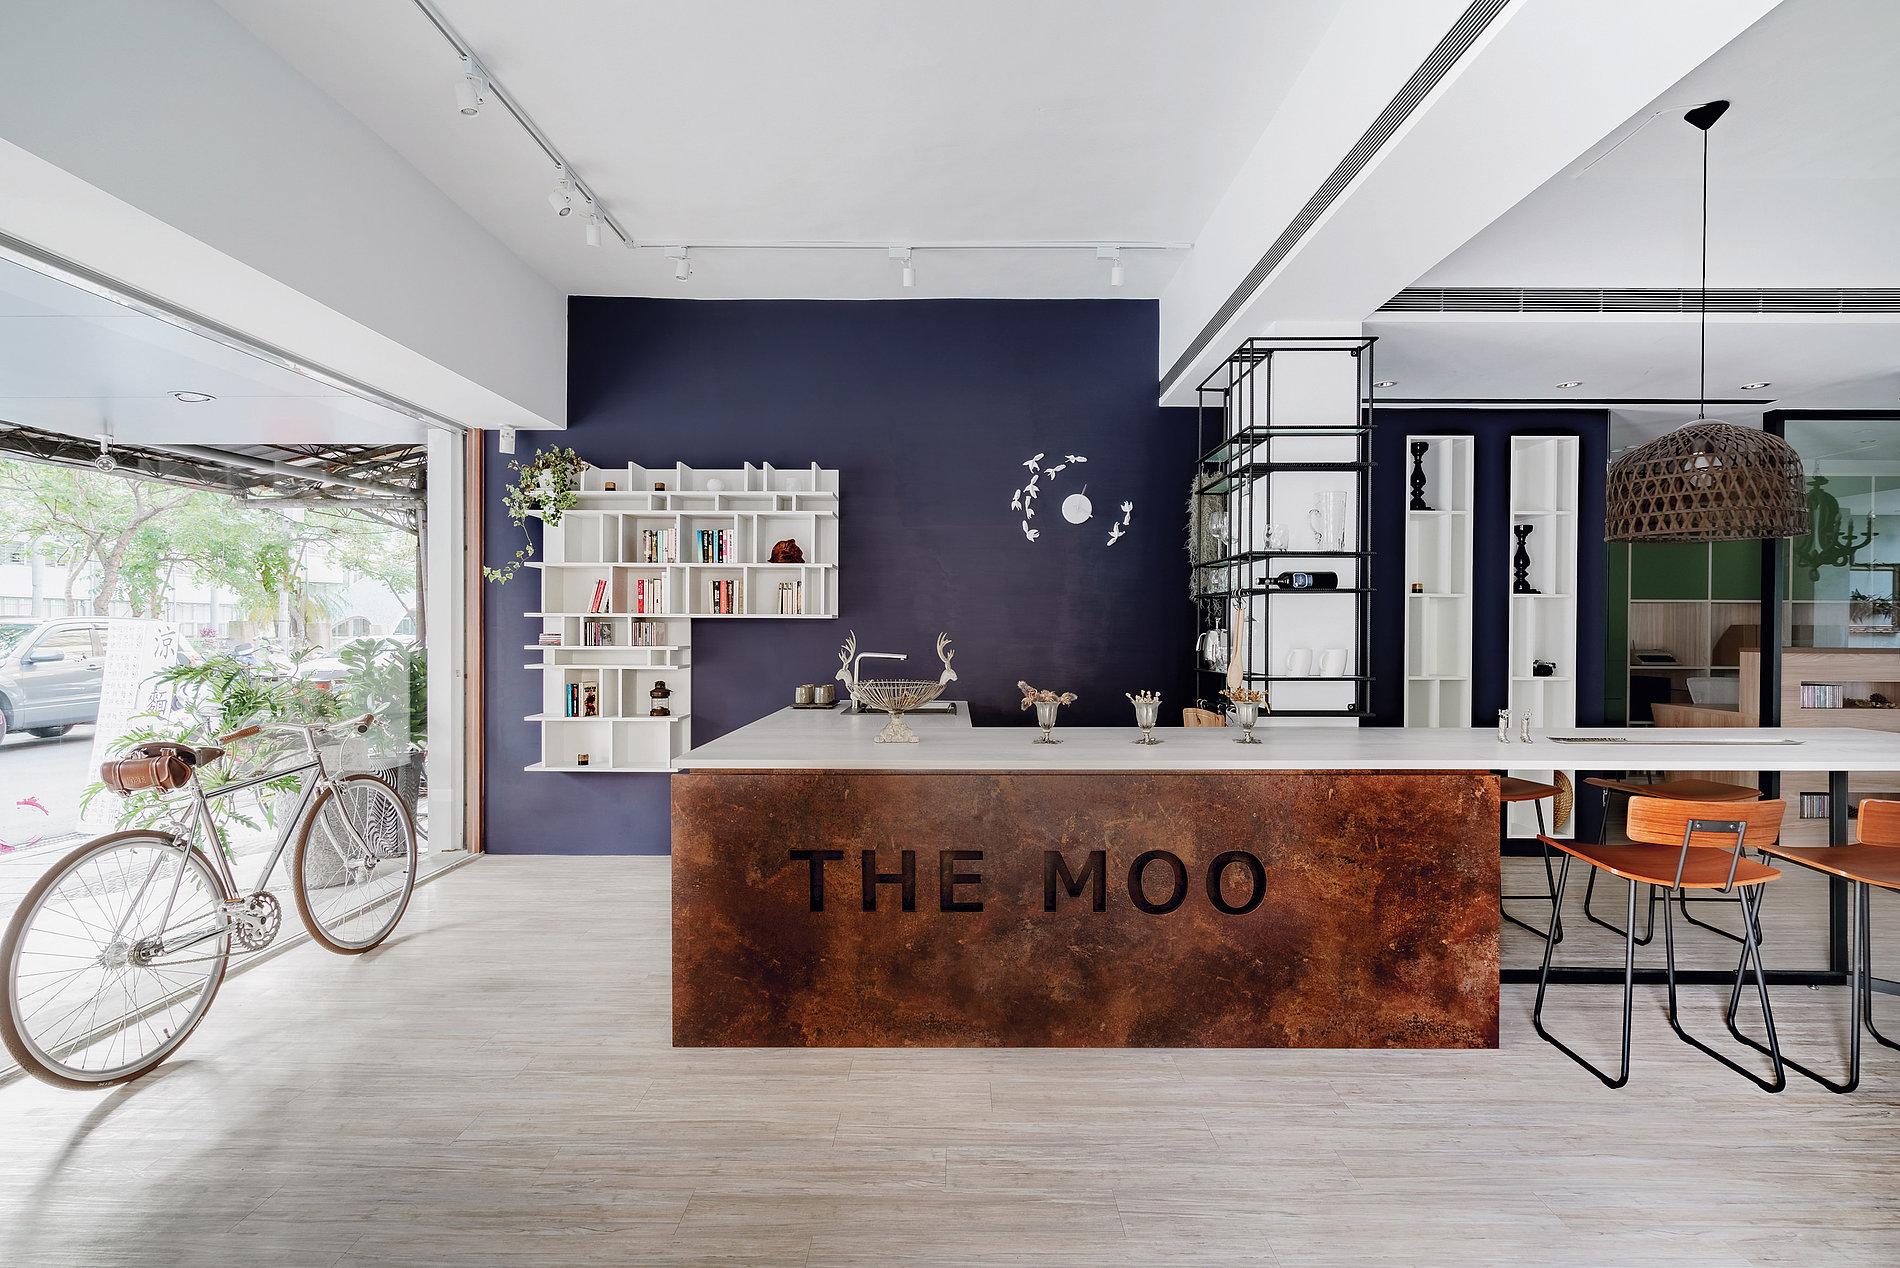 The Moo   Red Dot Design Award